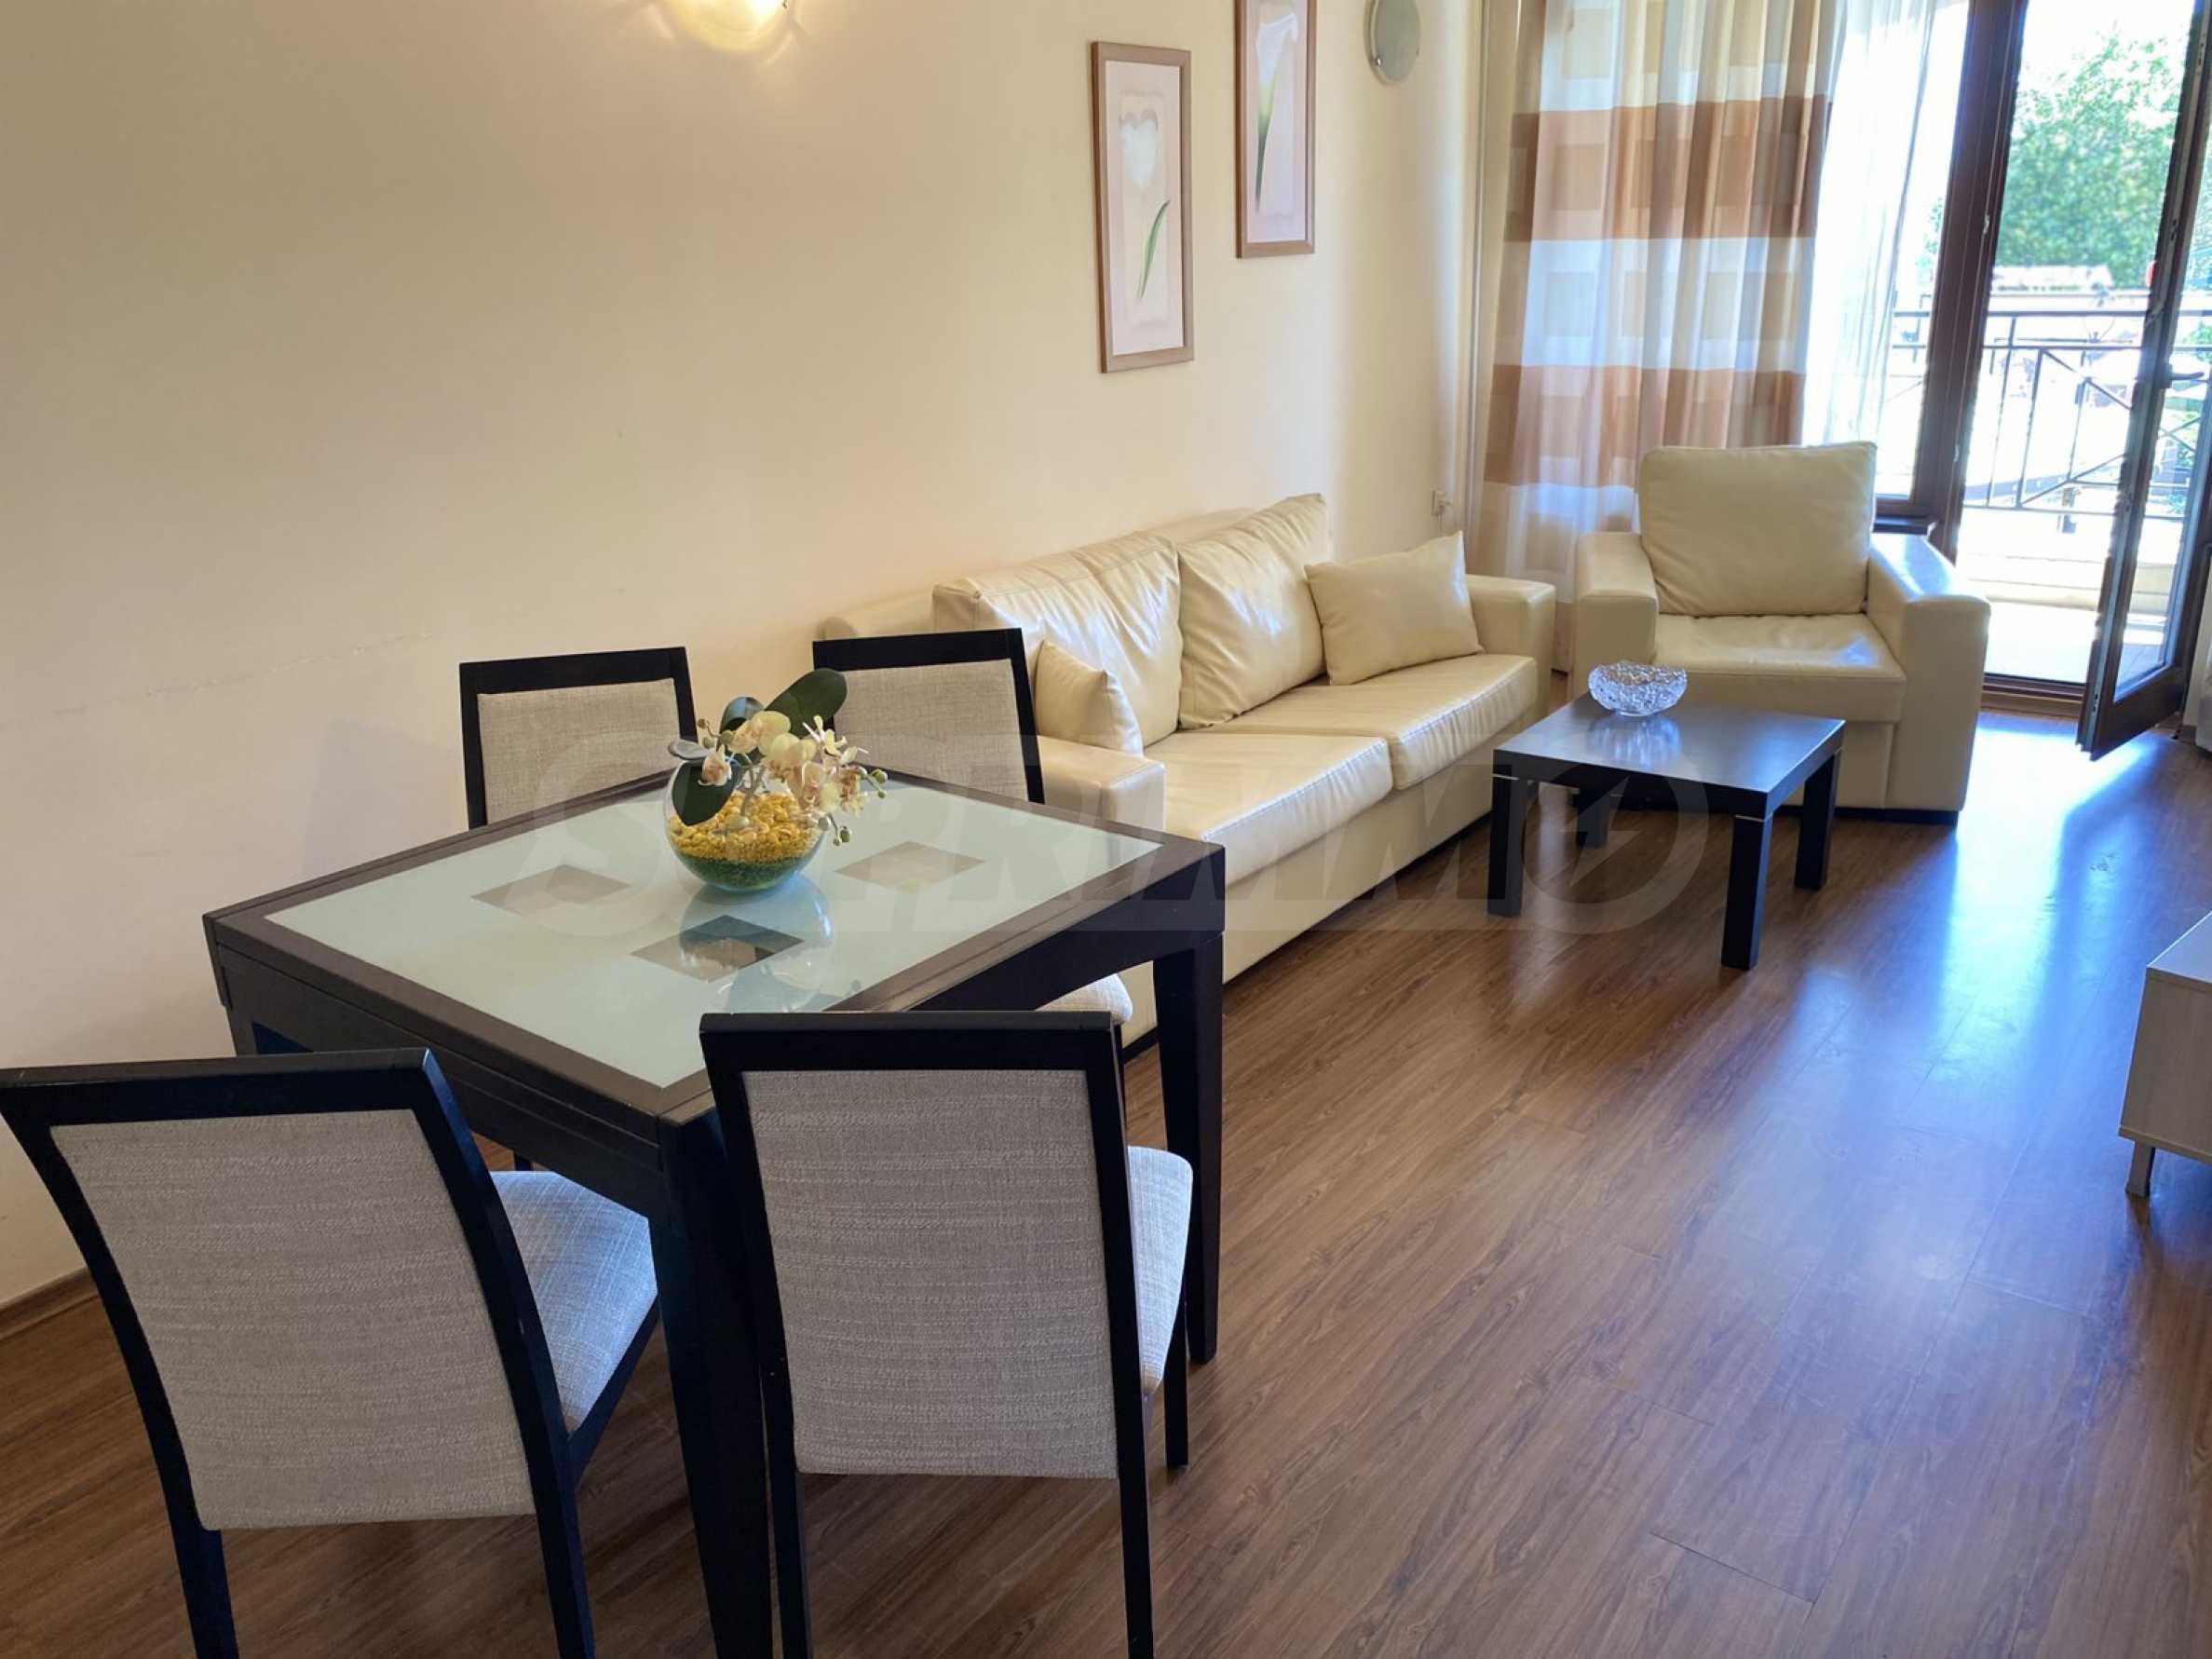 1-bedroom apartment Duralek